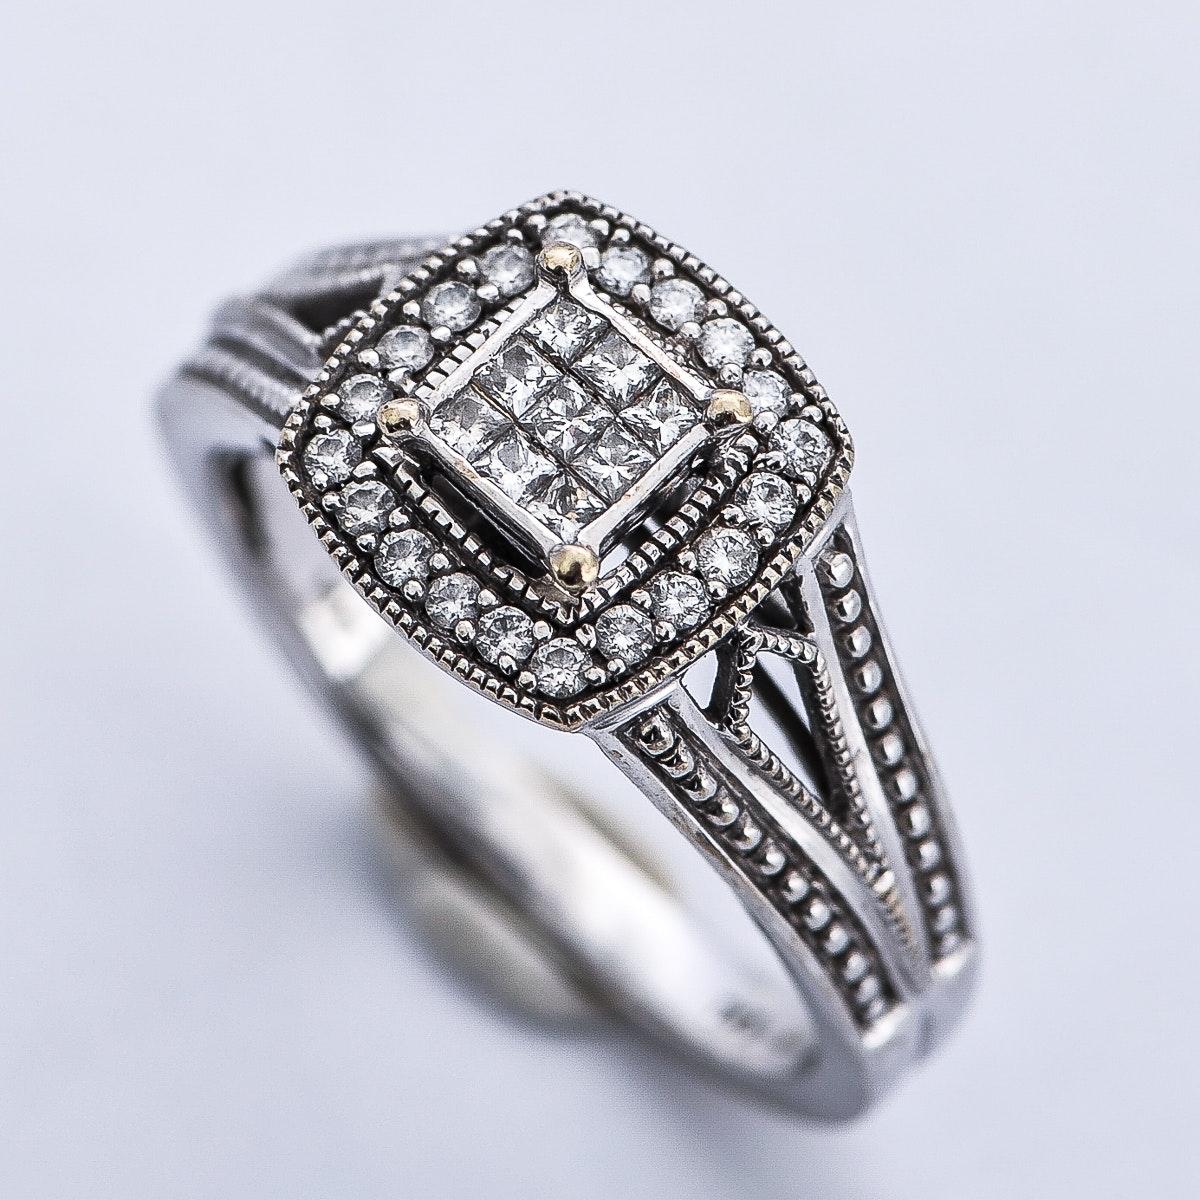 14K White Gold and Diamond Milgrain Engagement Ring with Surprise Diamond